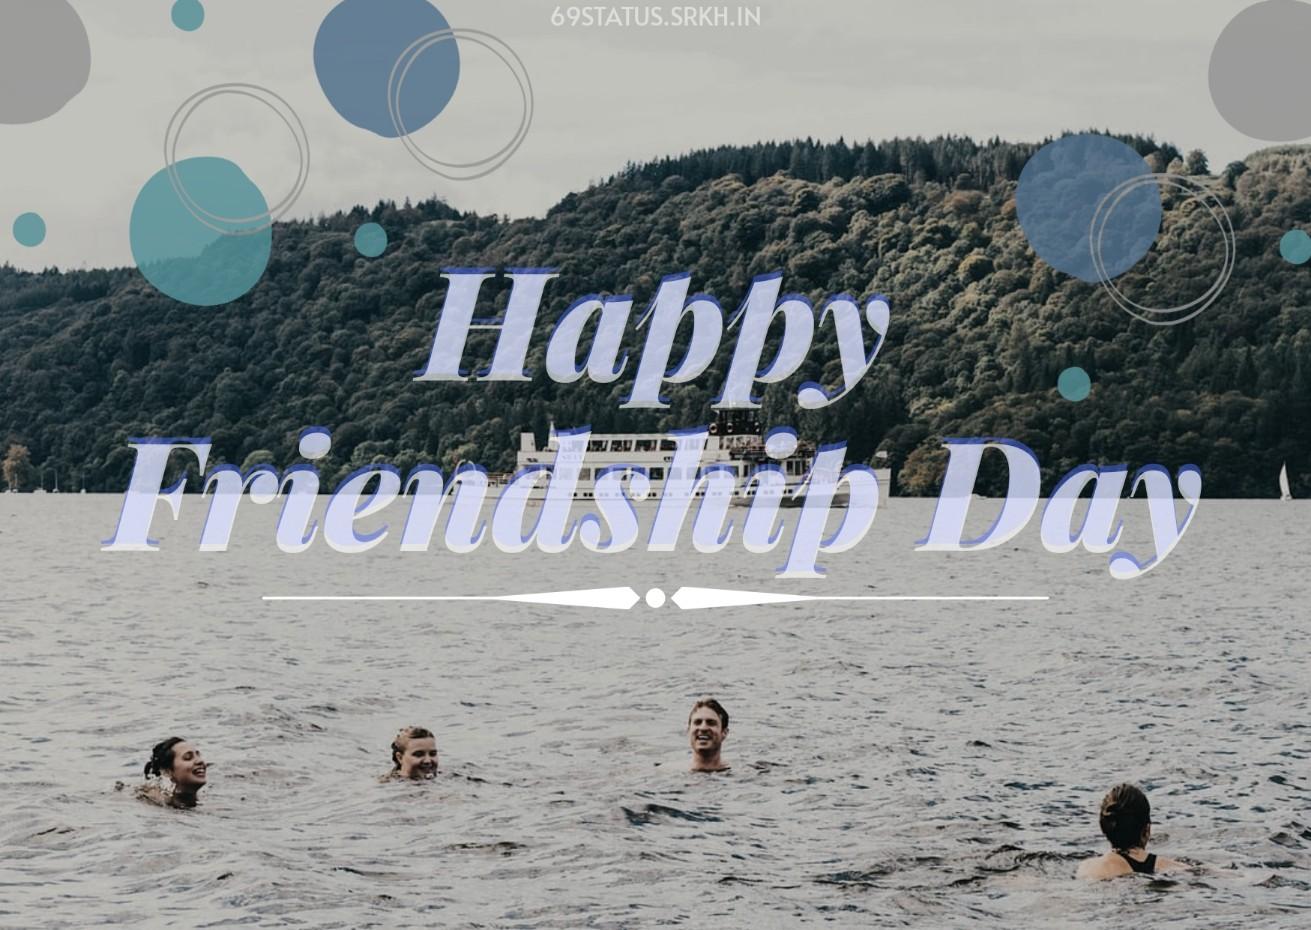 Happy Friendship Day Pics HD full HD free download.